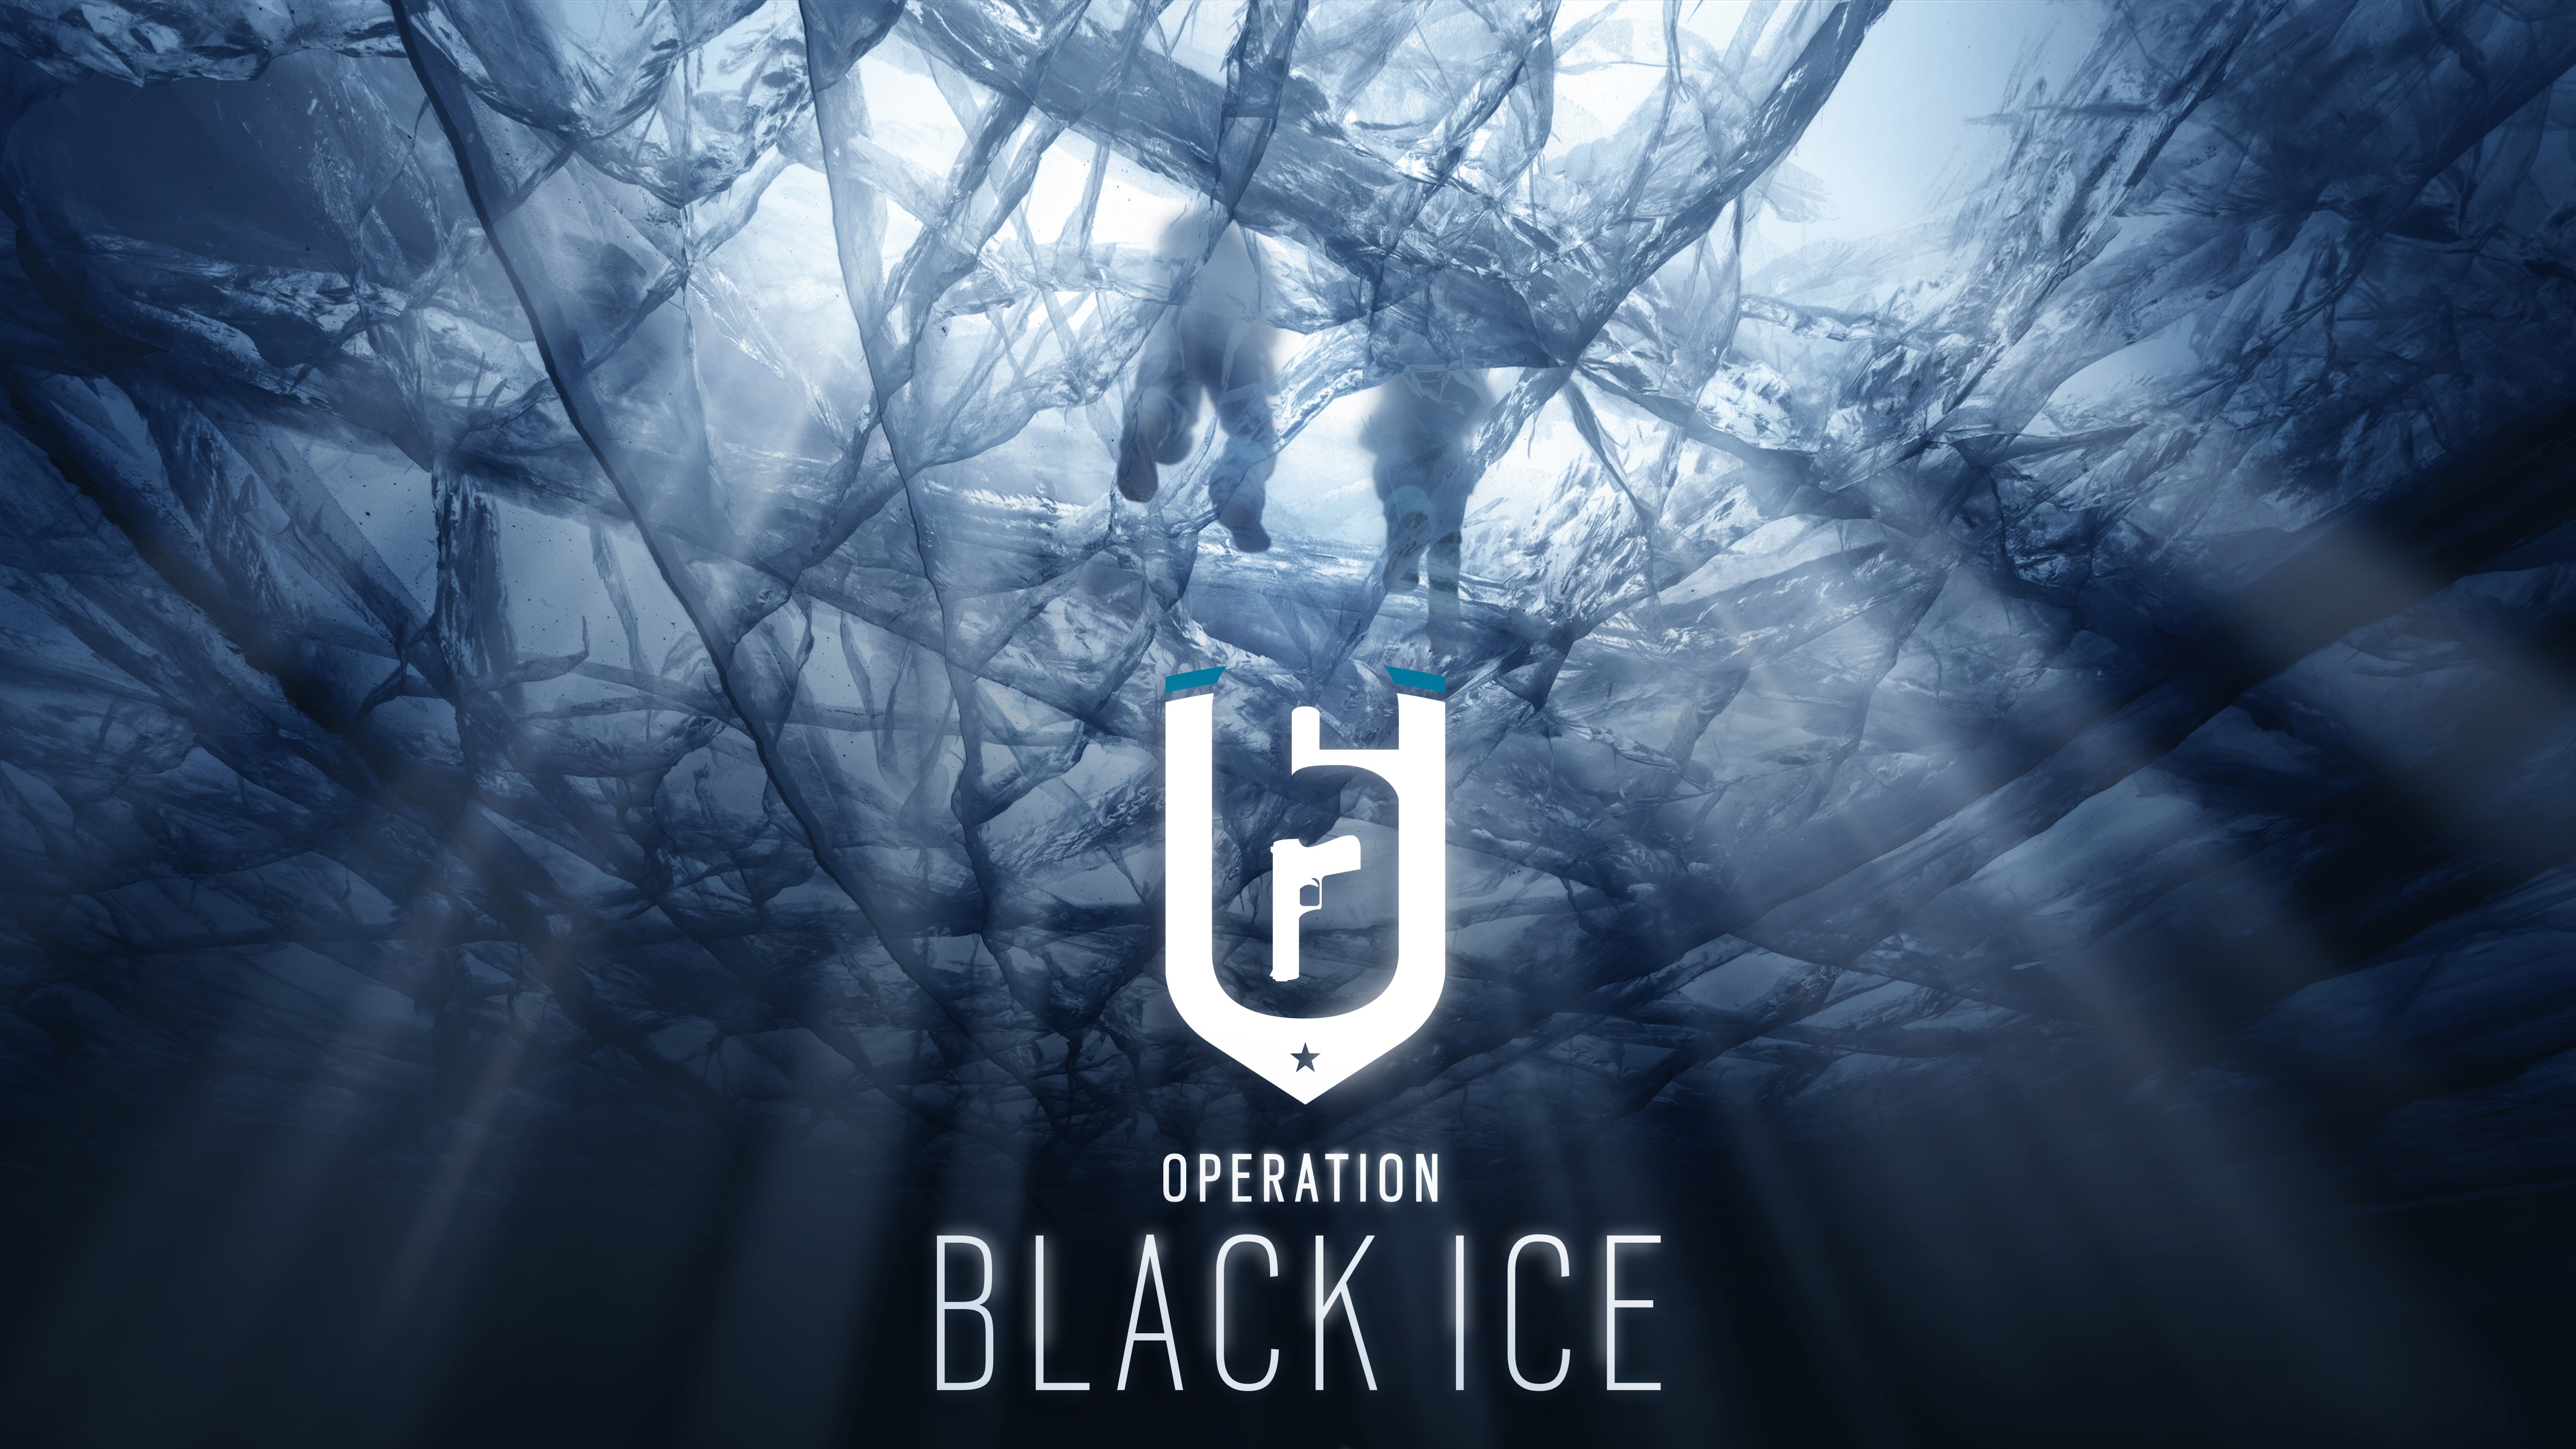 God Of War Wallpaper Hd 3d Download Rainbow Six Siege Operation Black Ice 4k 8k Wallpapers